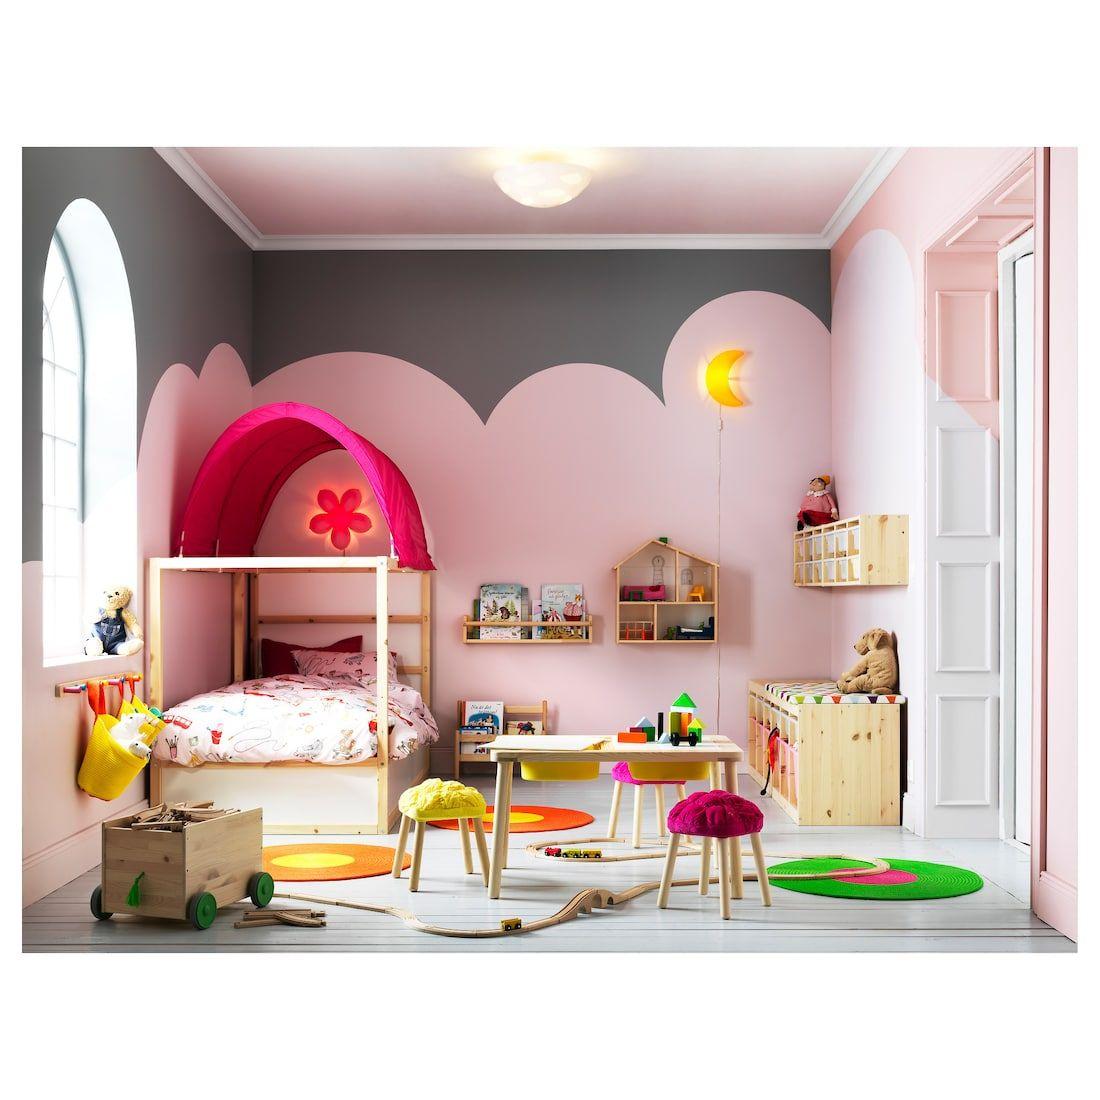 KURA Reversible bed, white, pine, Twin IKEA Girl room